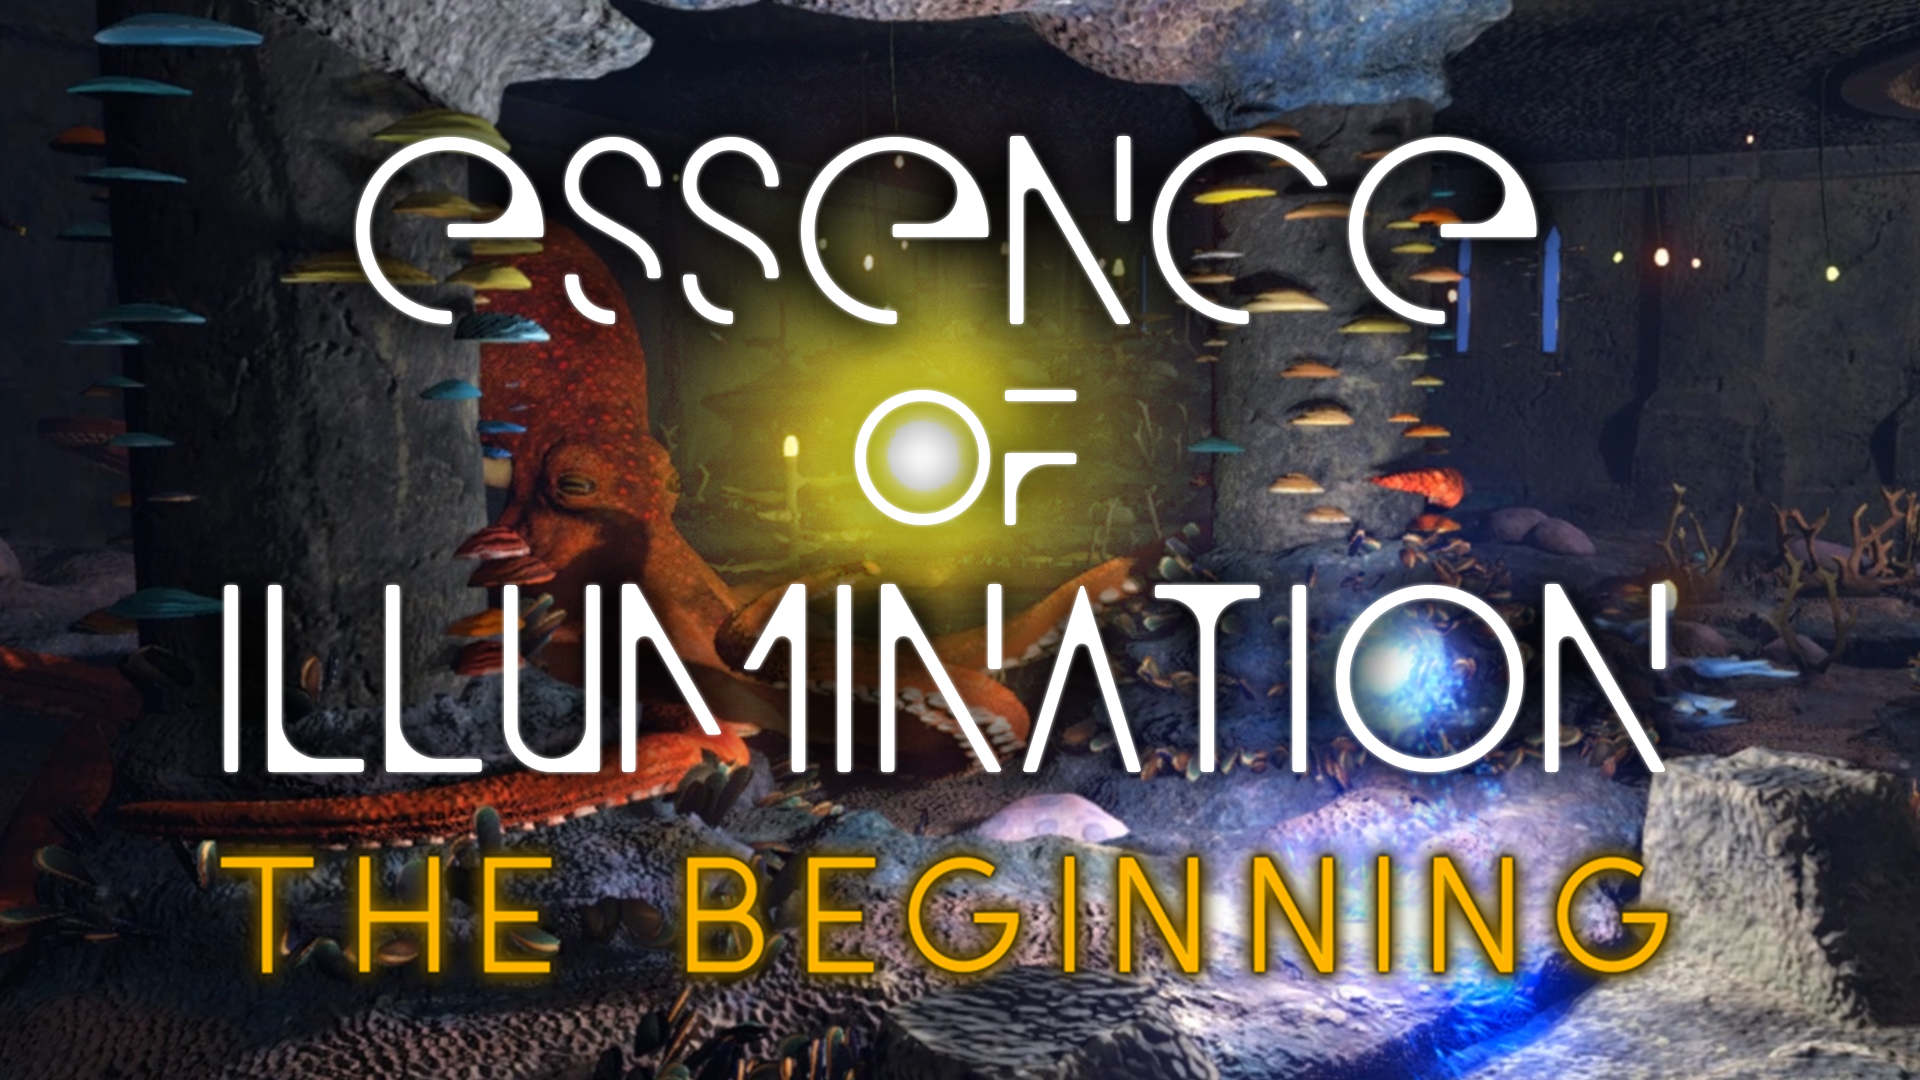 Essence of Illumination